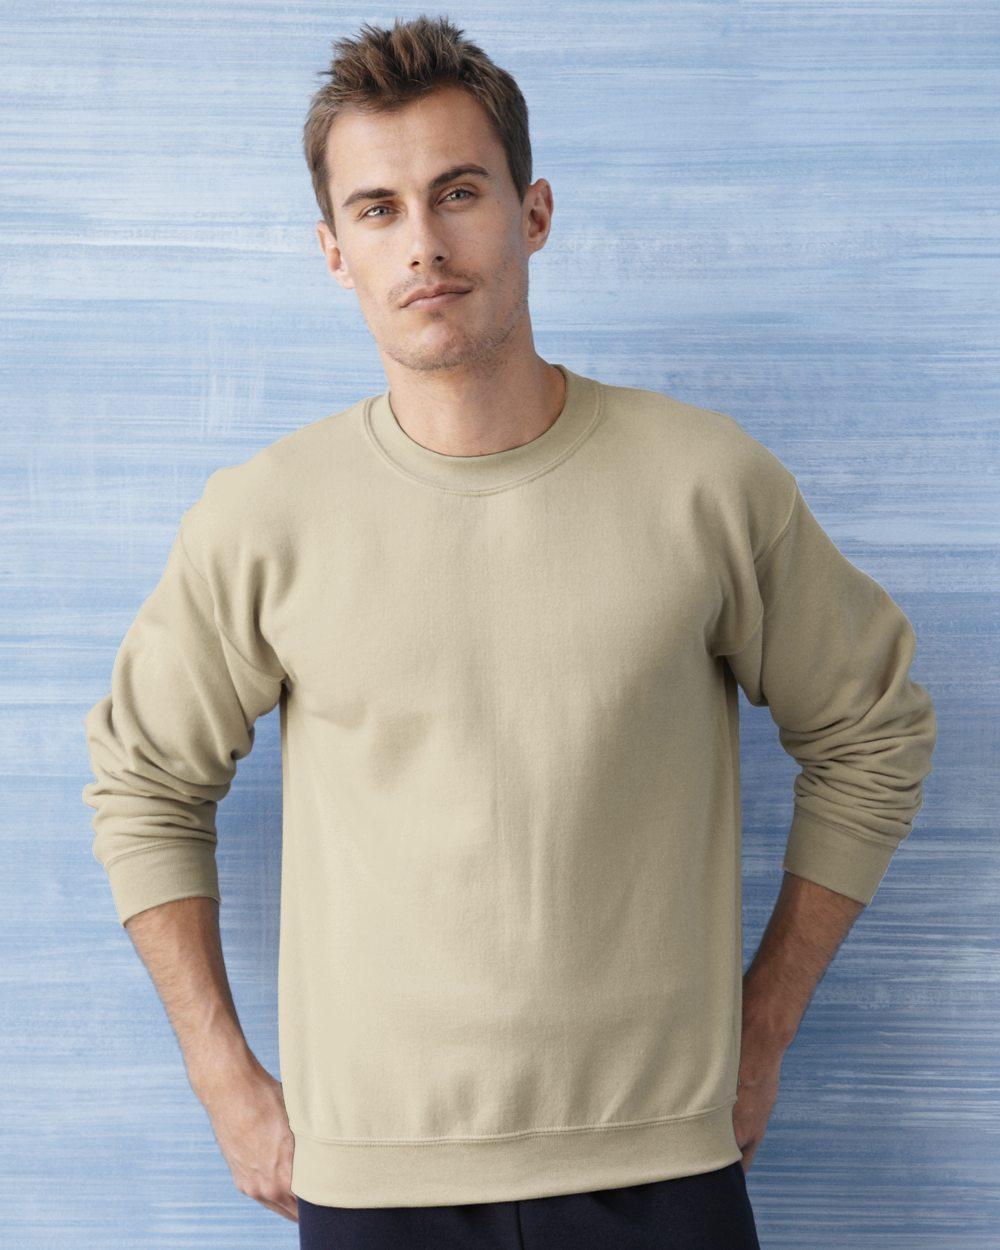 18000 Blend Shirt Gildan Heavy Item Sweatshirt Crewneck 5050 FU0401q